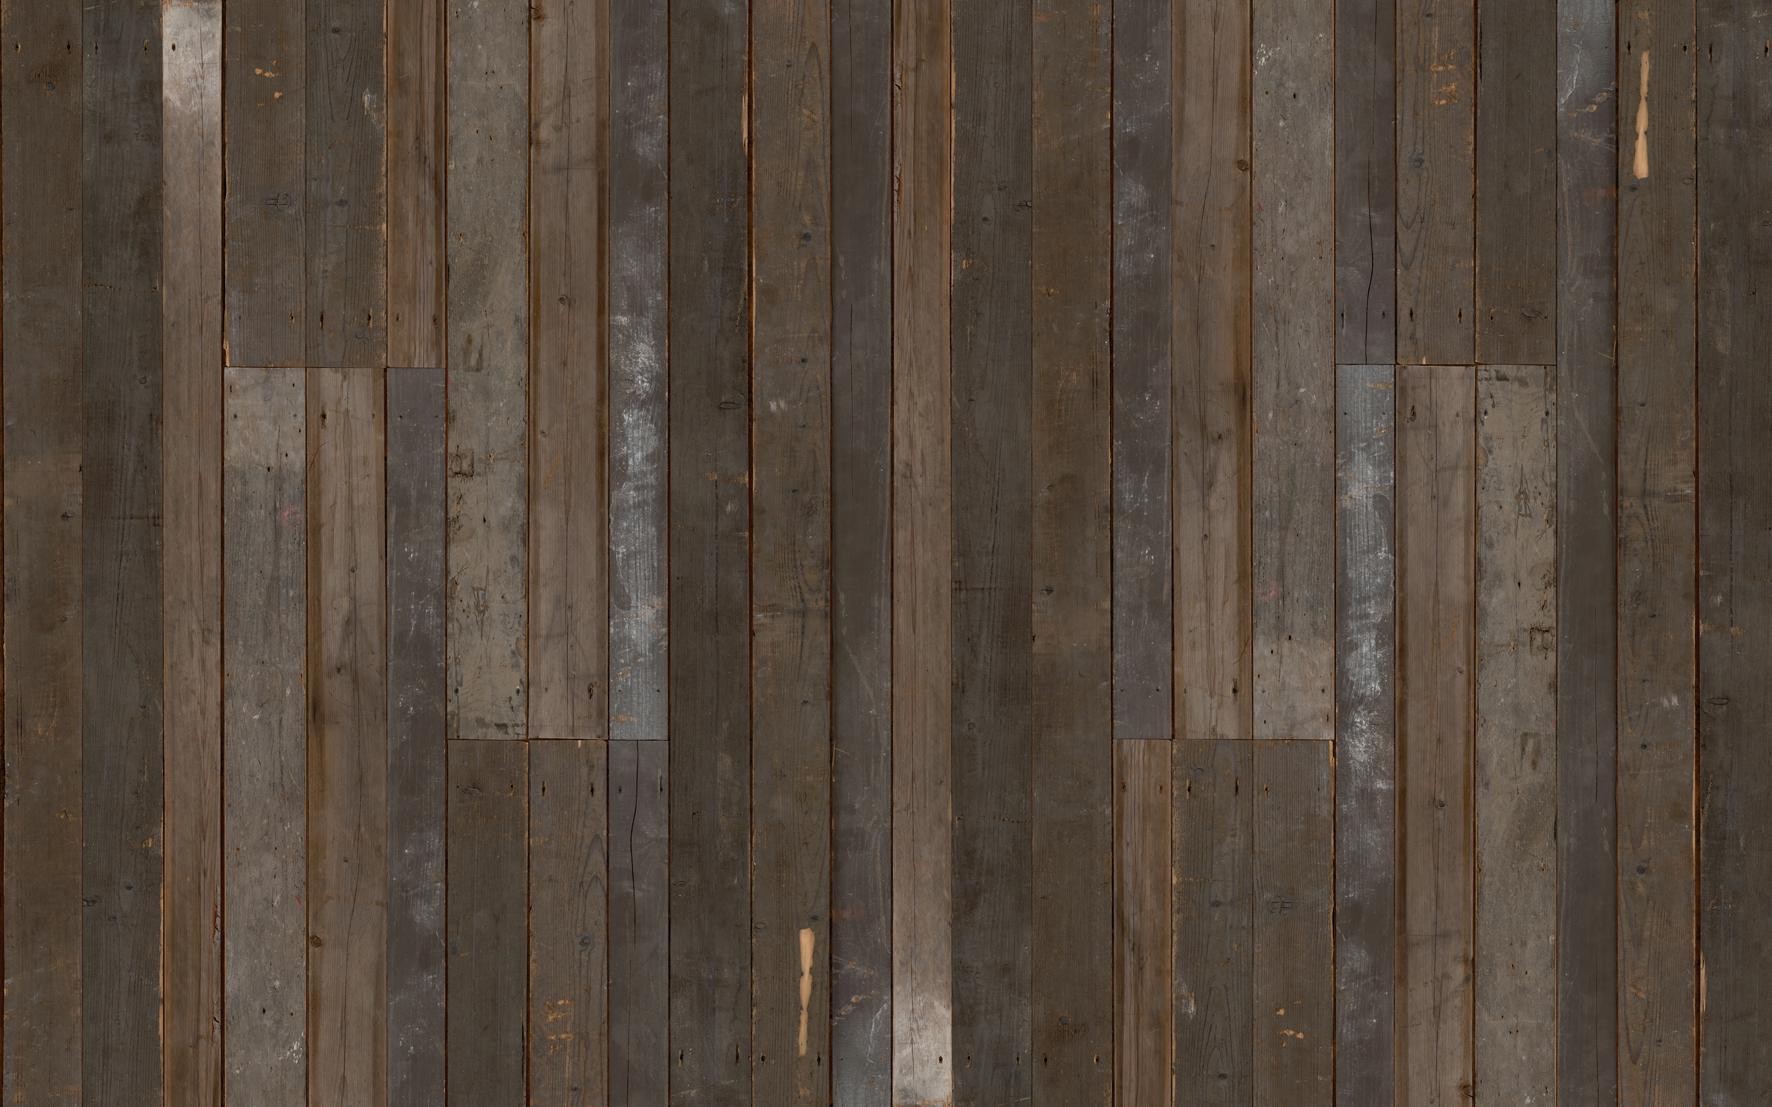 artisanal wallpaper on a design high oikos blog